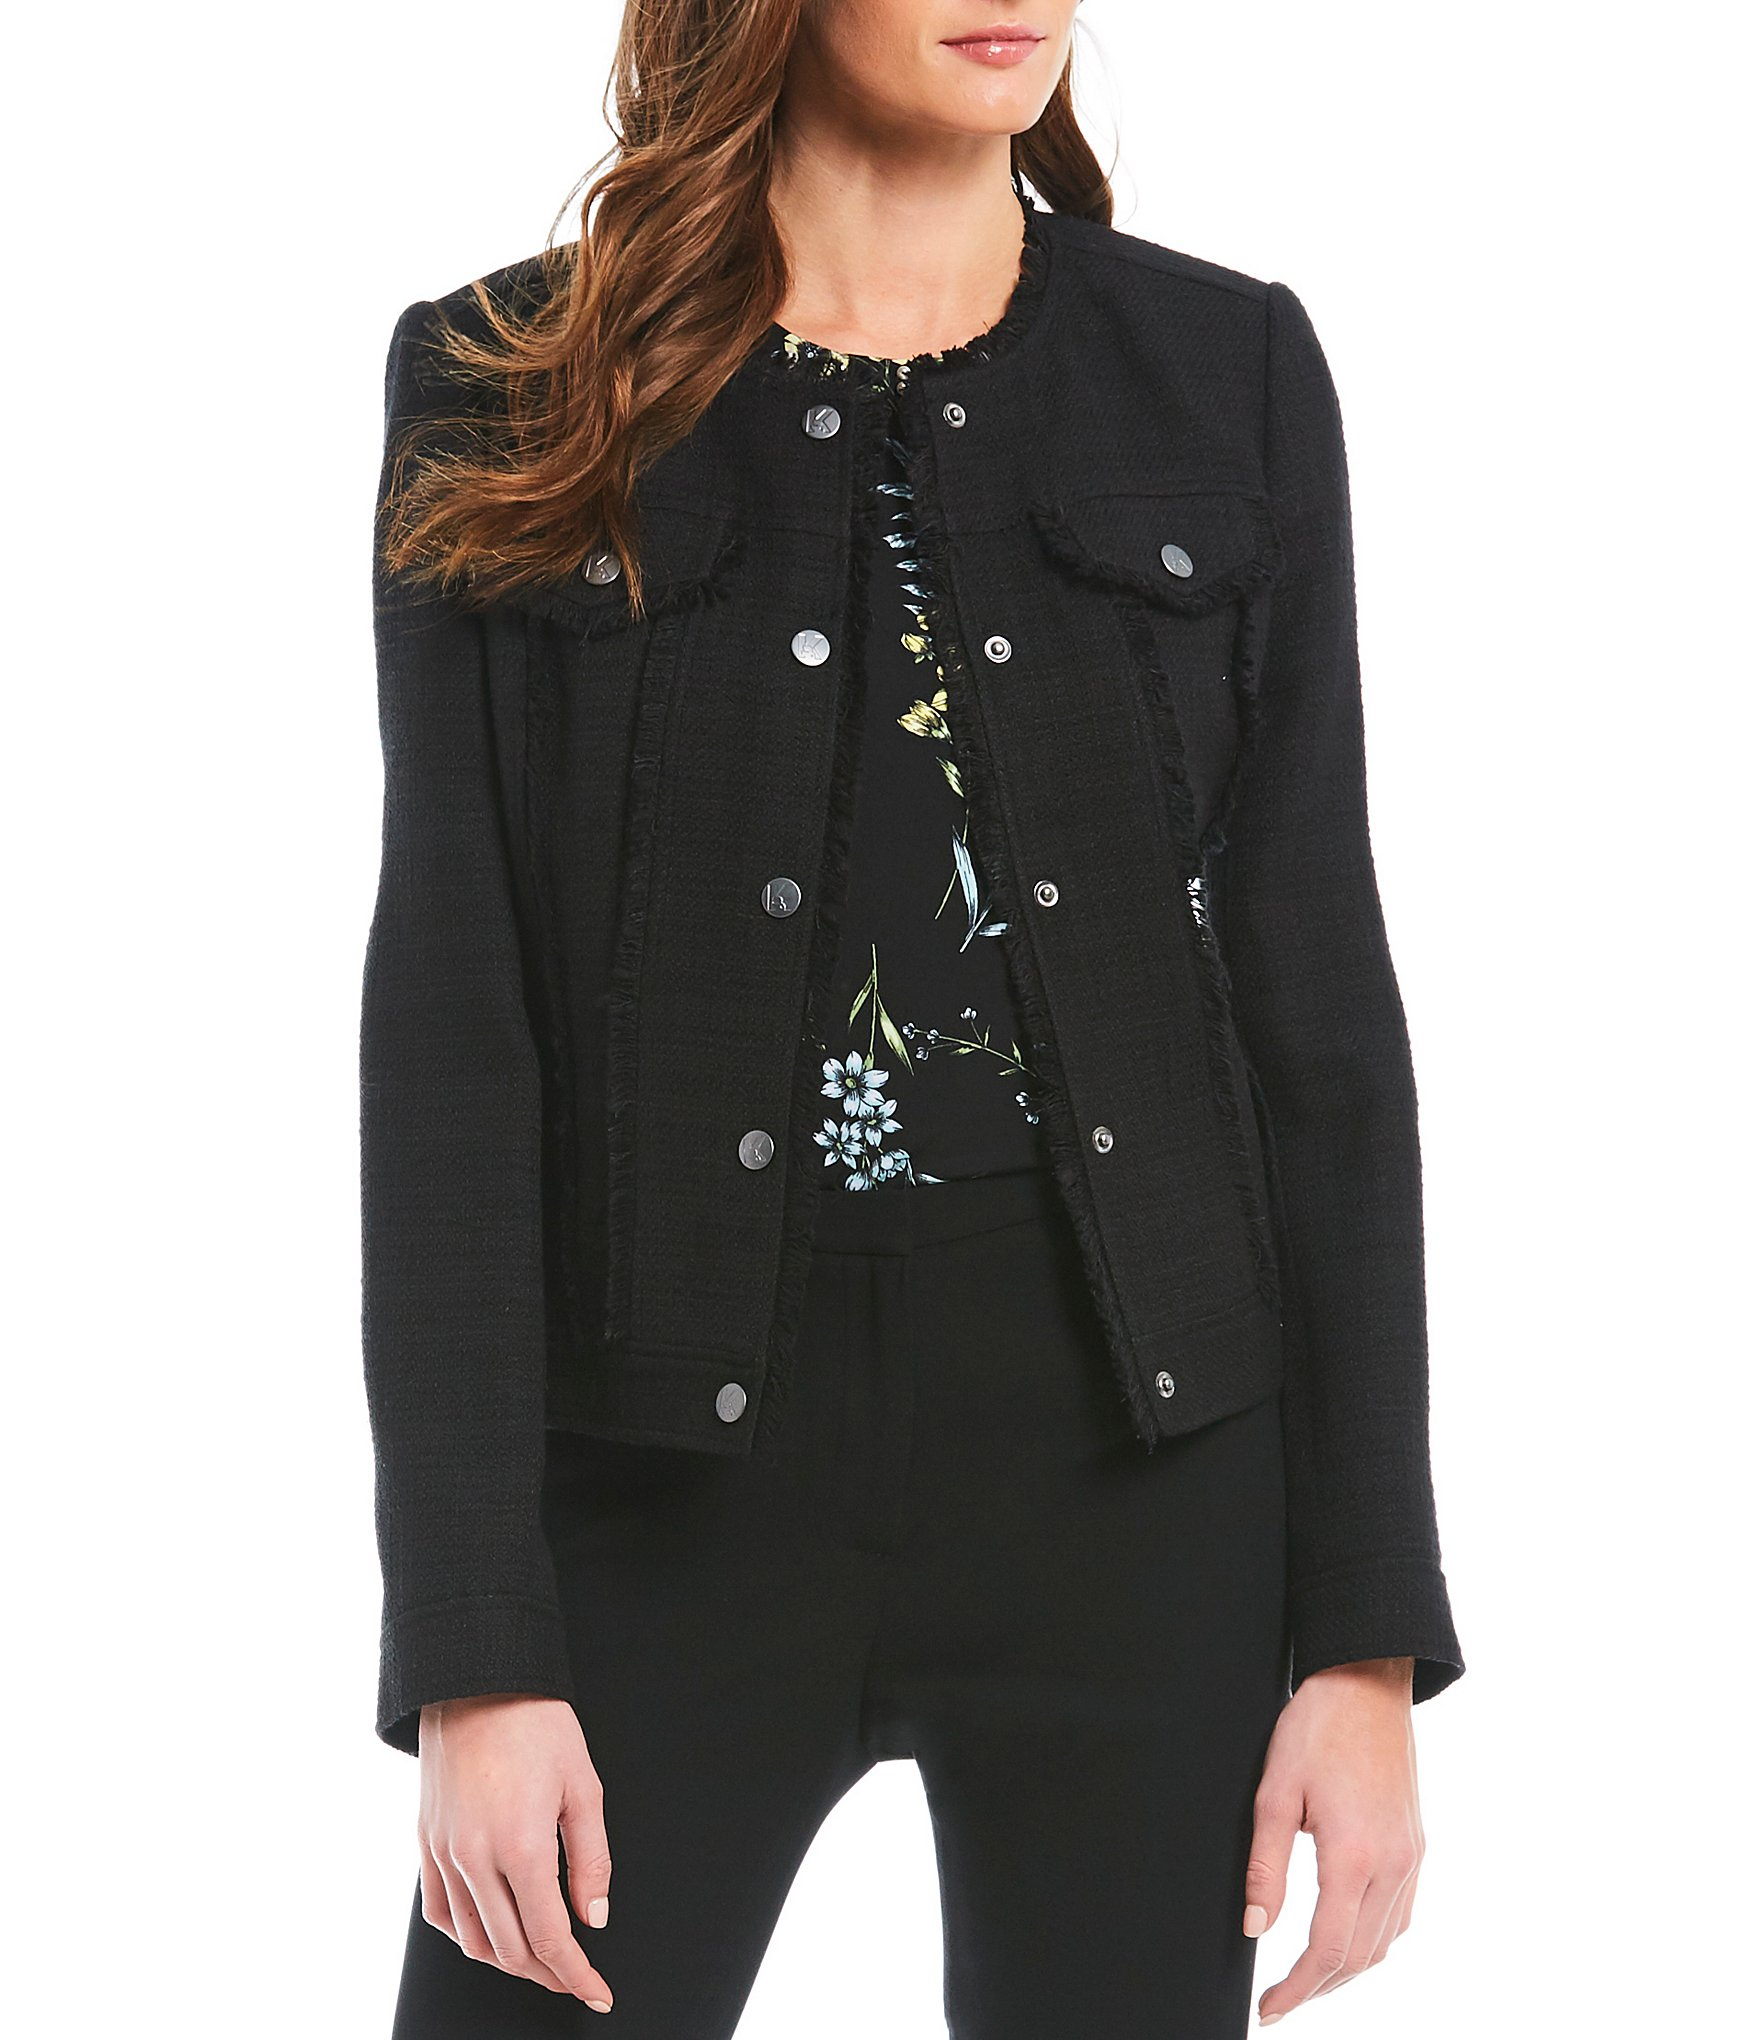 773c60672663 KARL LAGERFELD PARIS Button Up Tweed With Fringe Denim Jacket ...